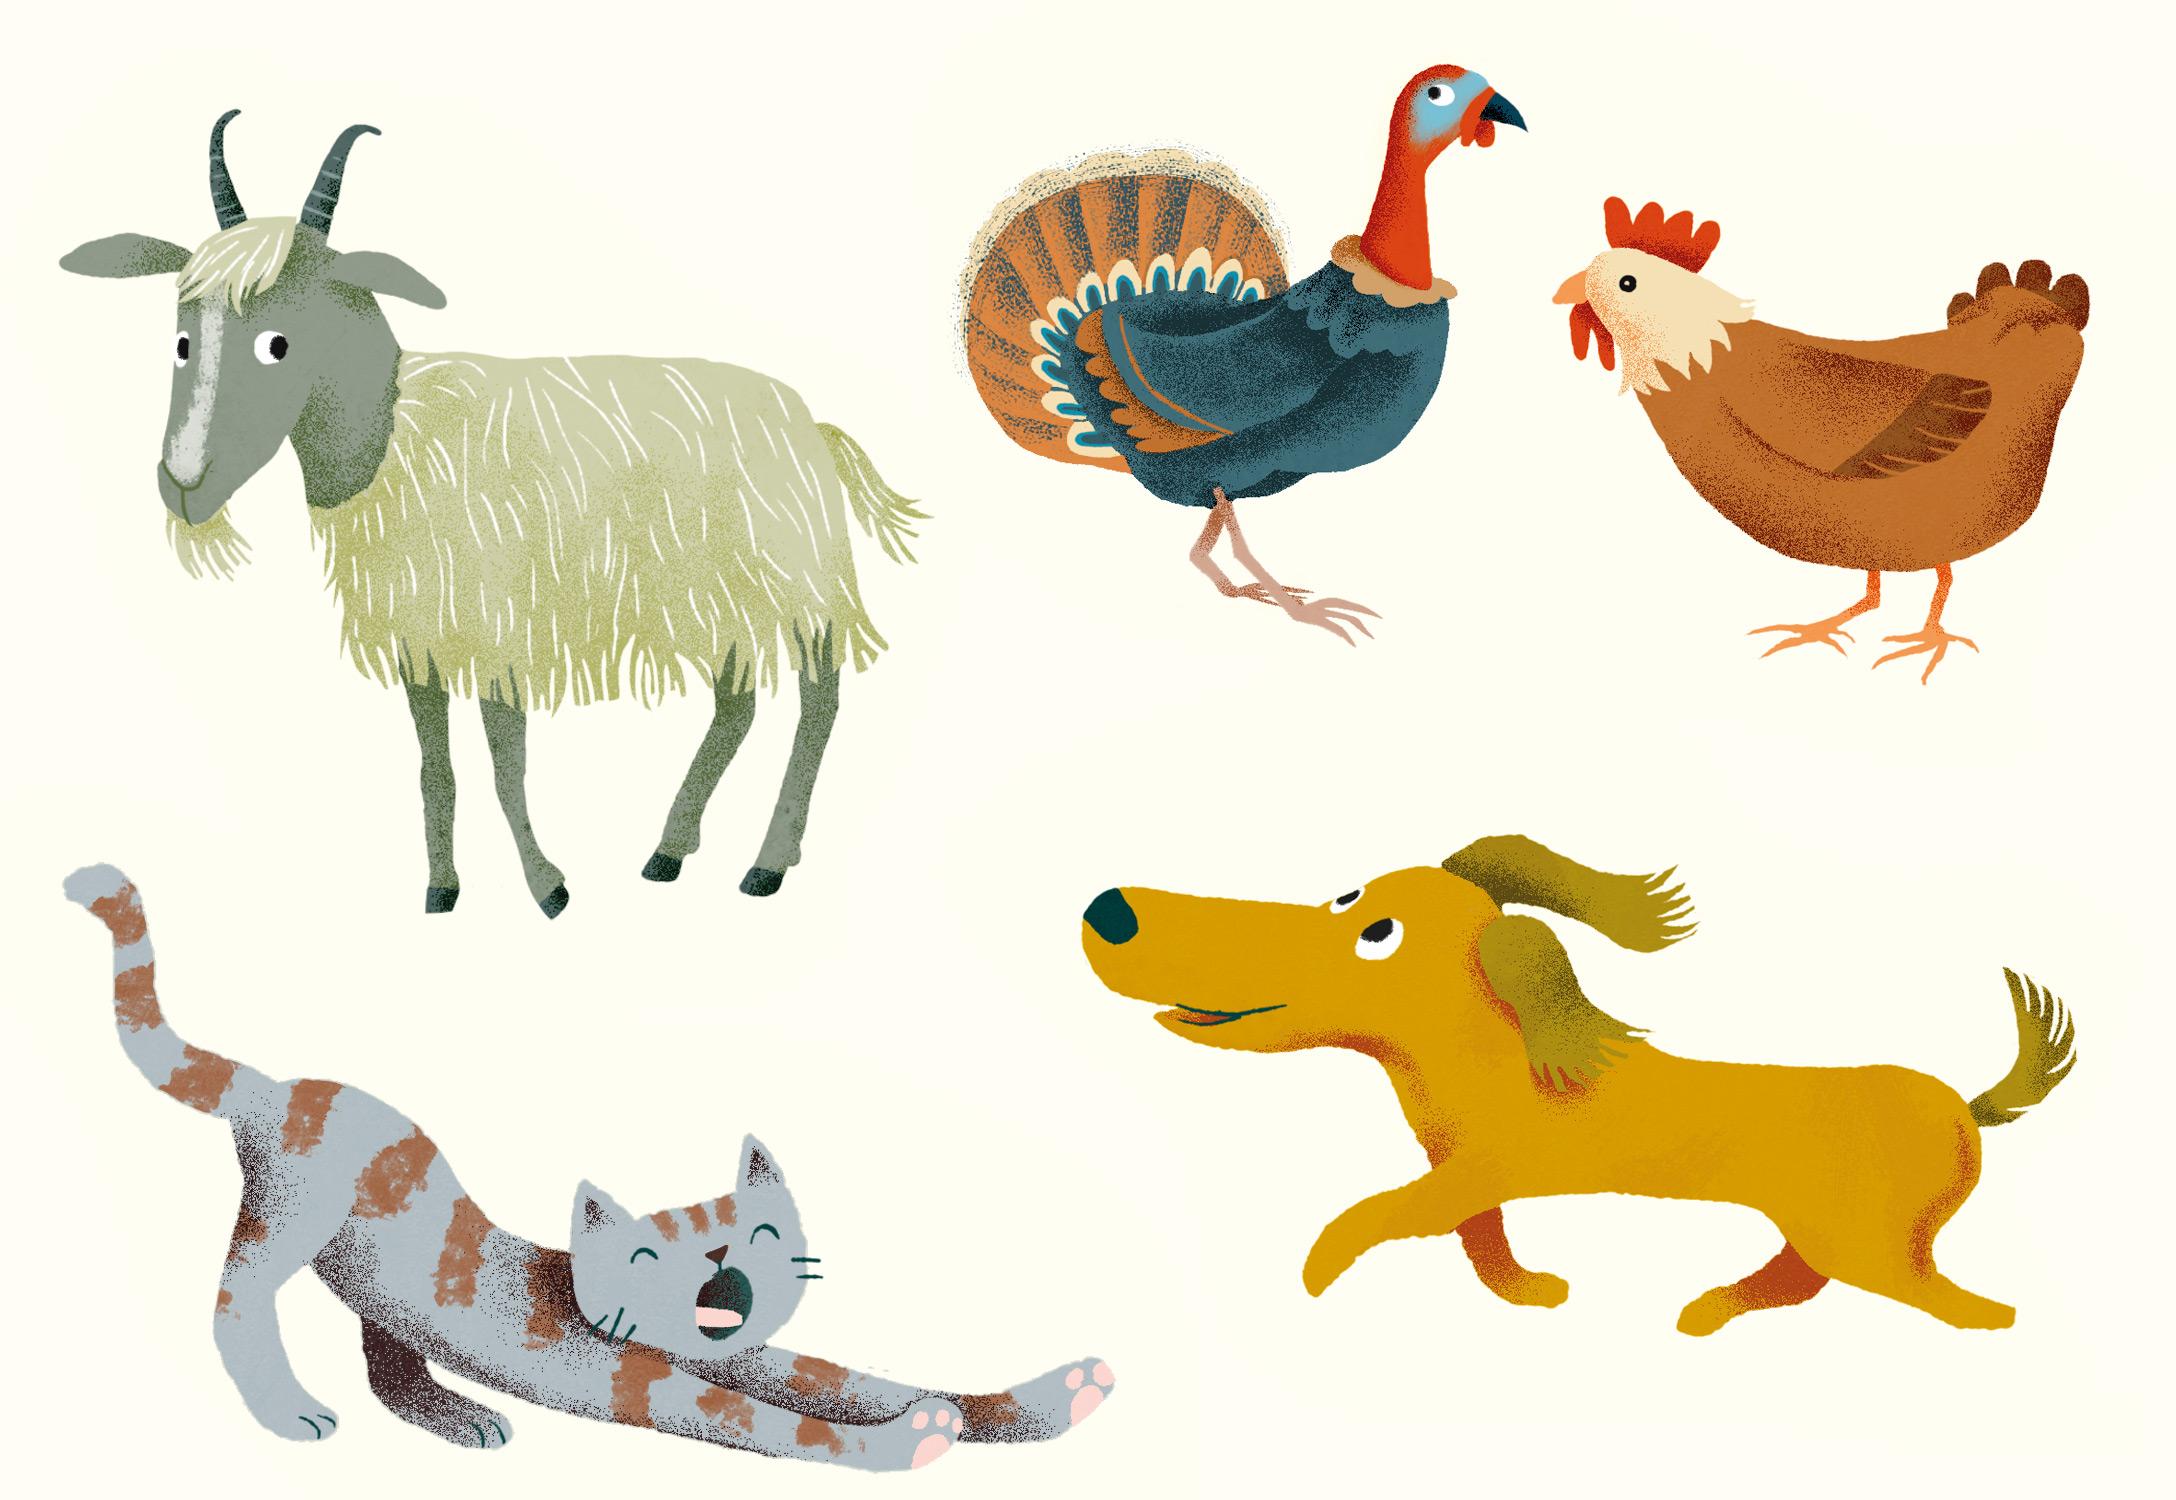 Annalisa Papagna illustration - Farm animals: goat, cat, turkey